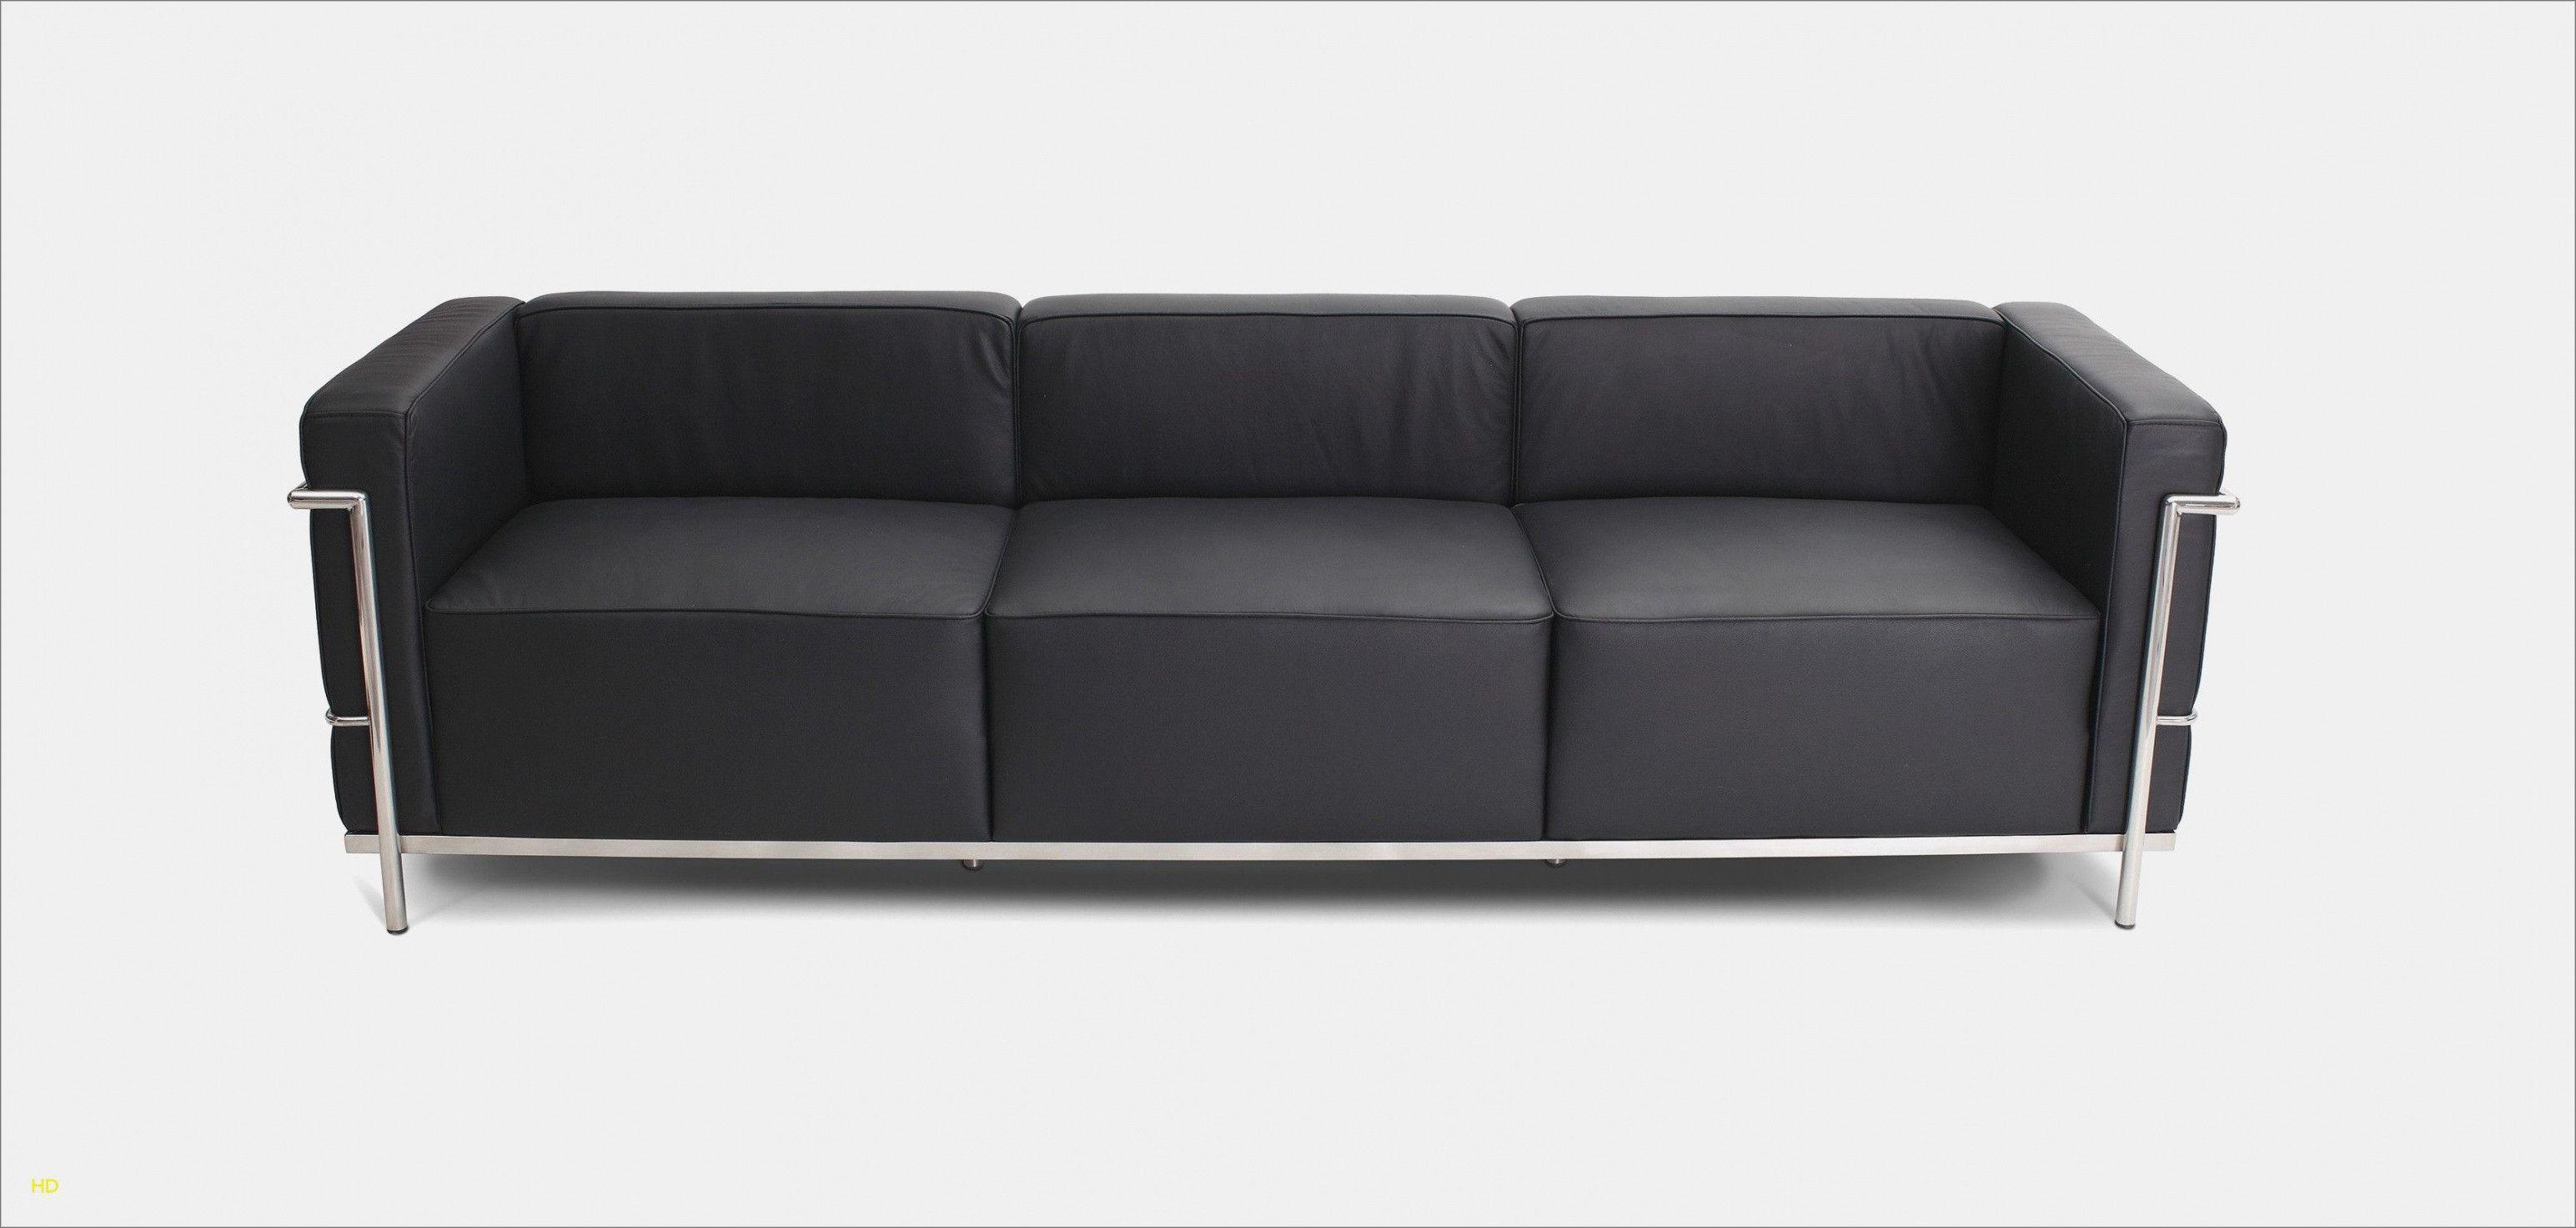 30 Unique Canape Gigogne Ikea Bonnes Idees